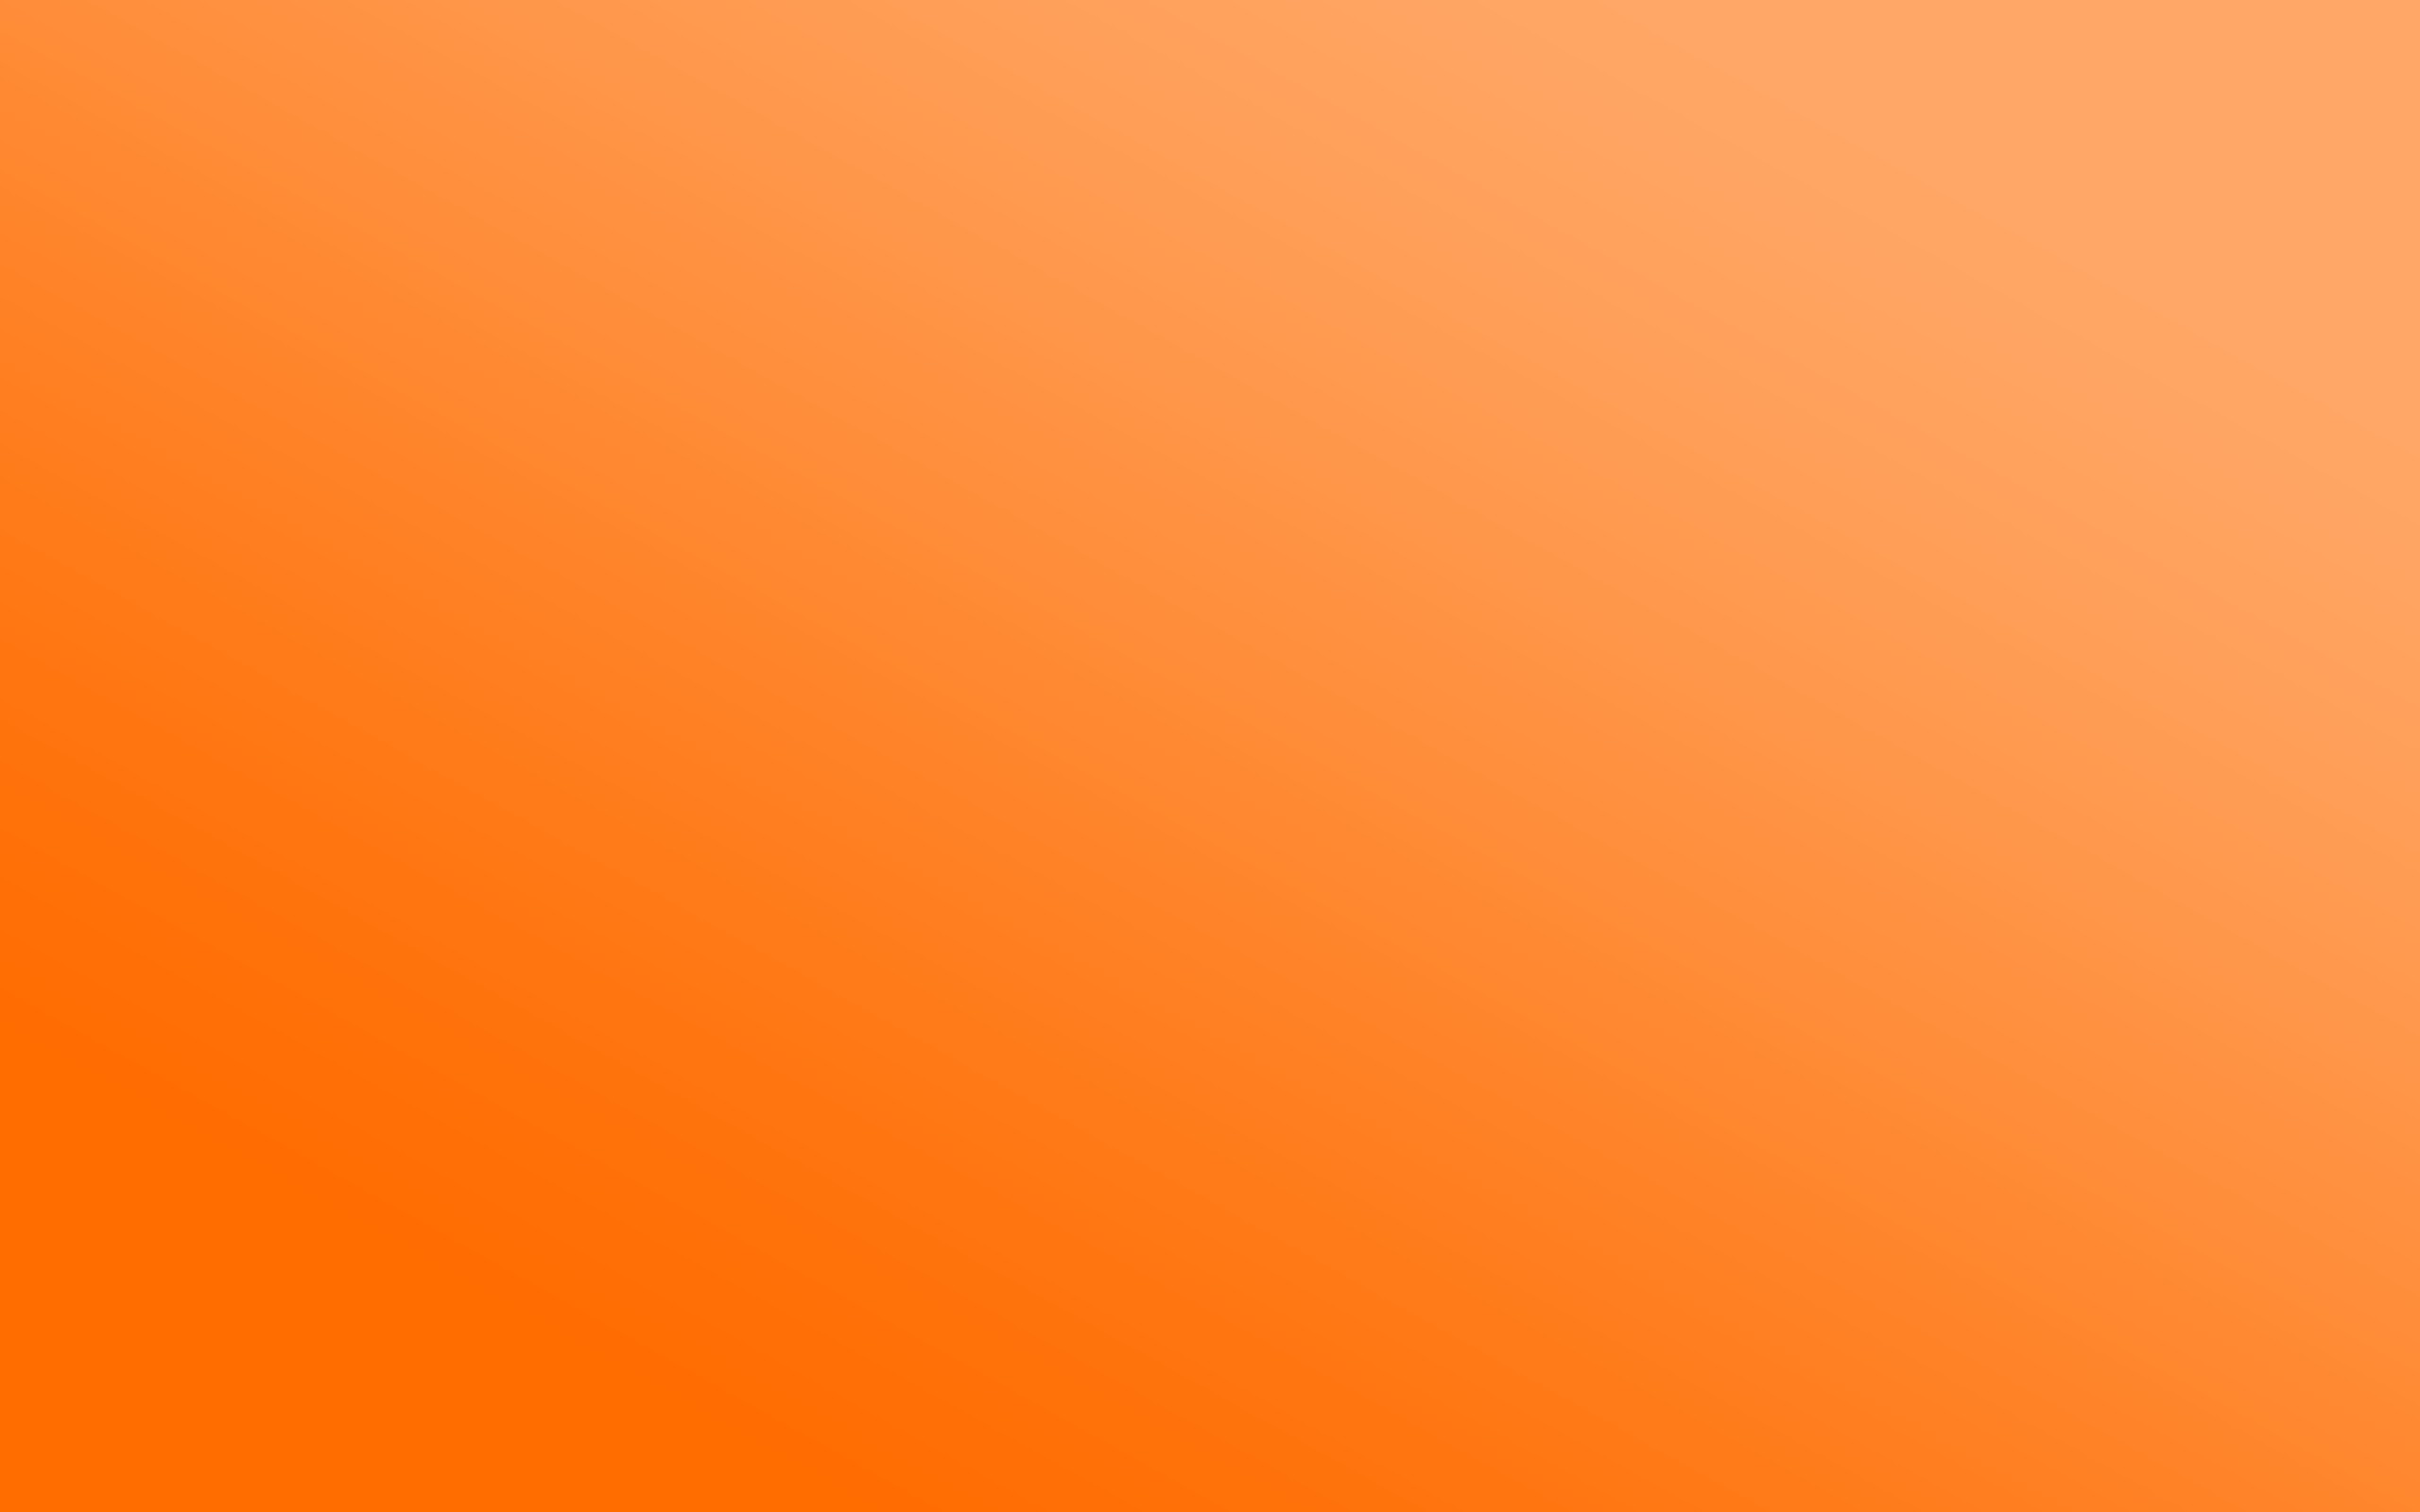 Solid Color Wallpaper 21960